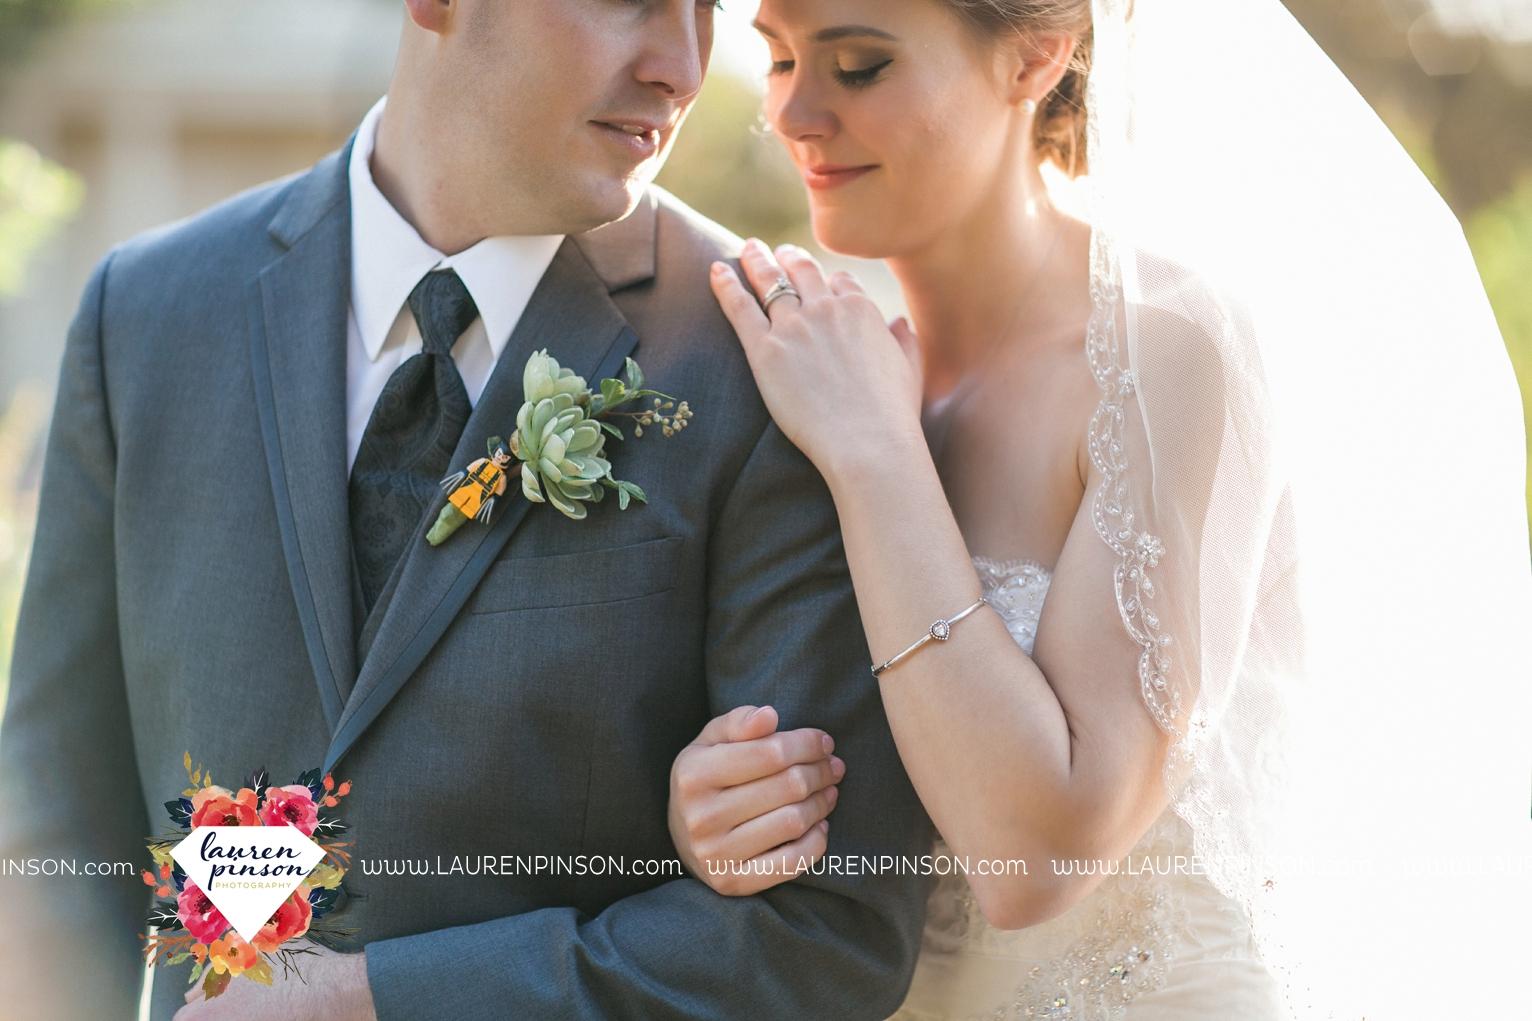 kemp-center-for-the-arts-wichita-falls-texas-wedding-photographer-fall-wedding-pumpkins-173.jpg